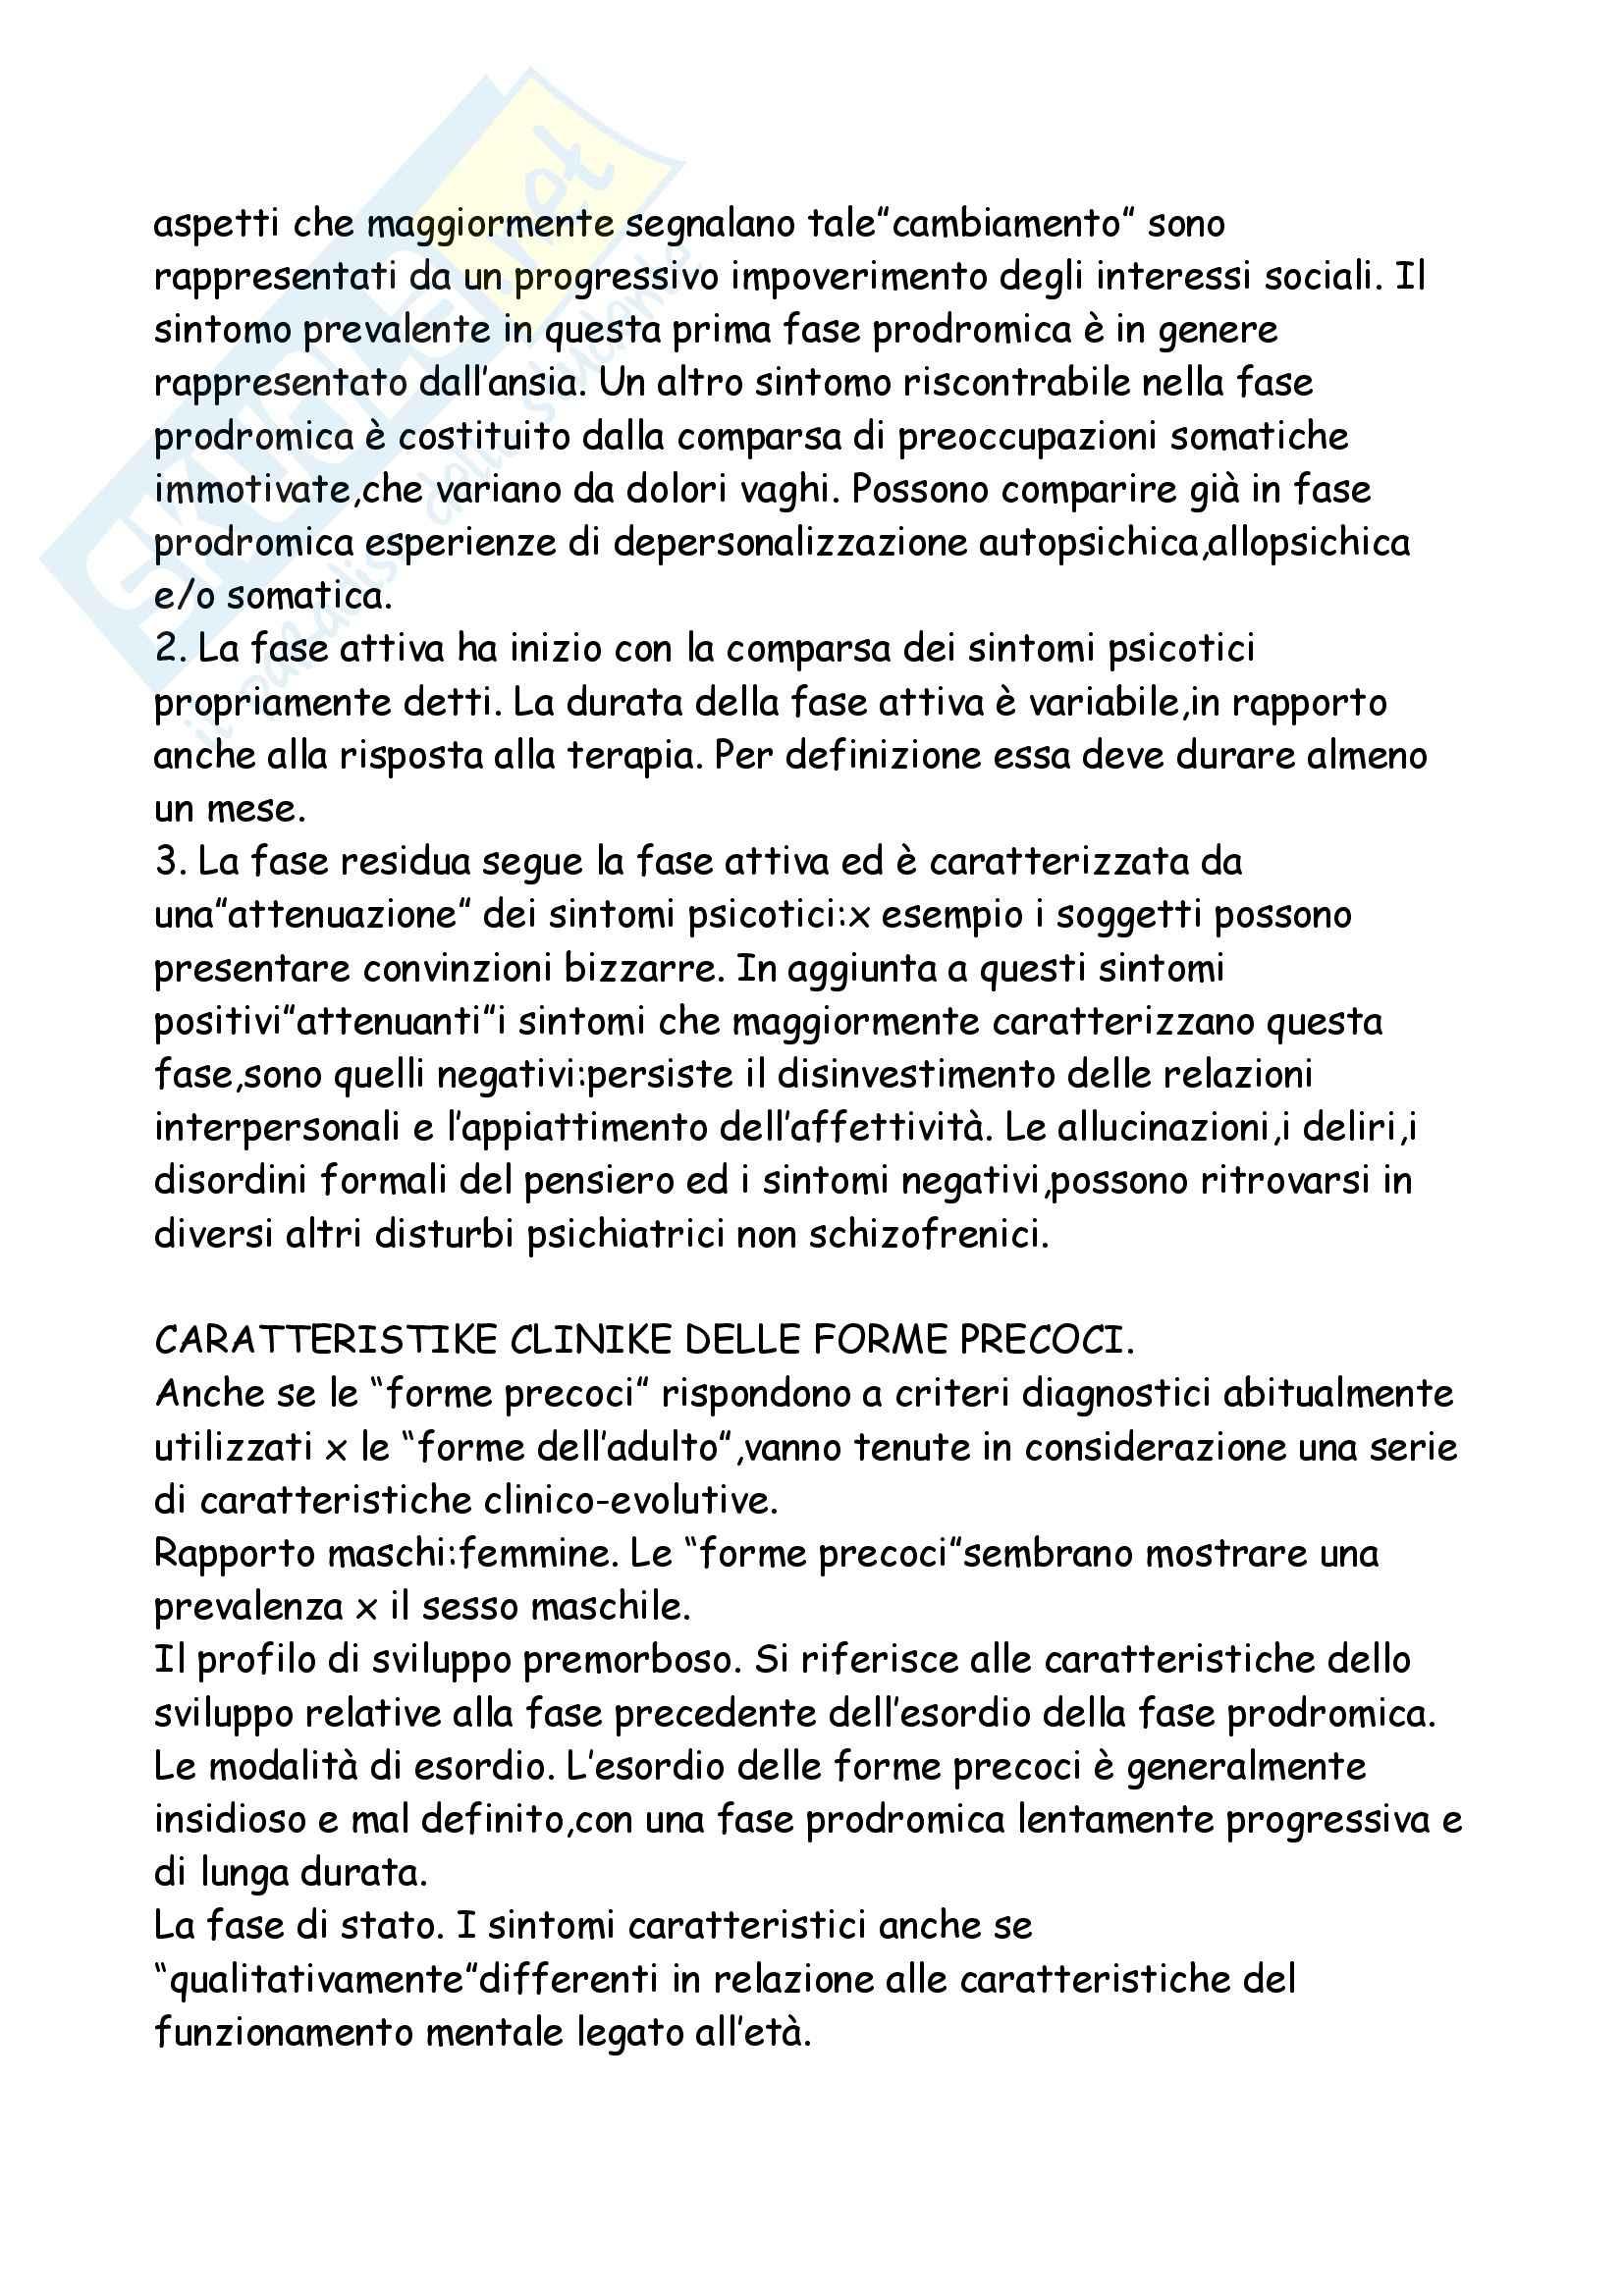 Neuropsichiatria Infantile Pag. 126